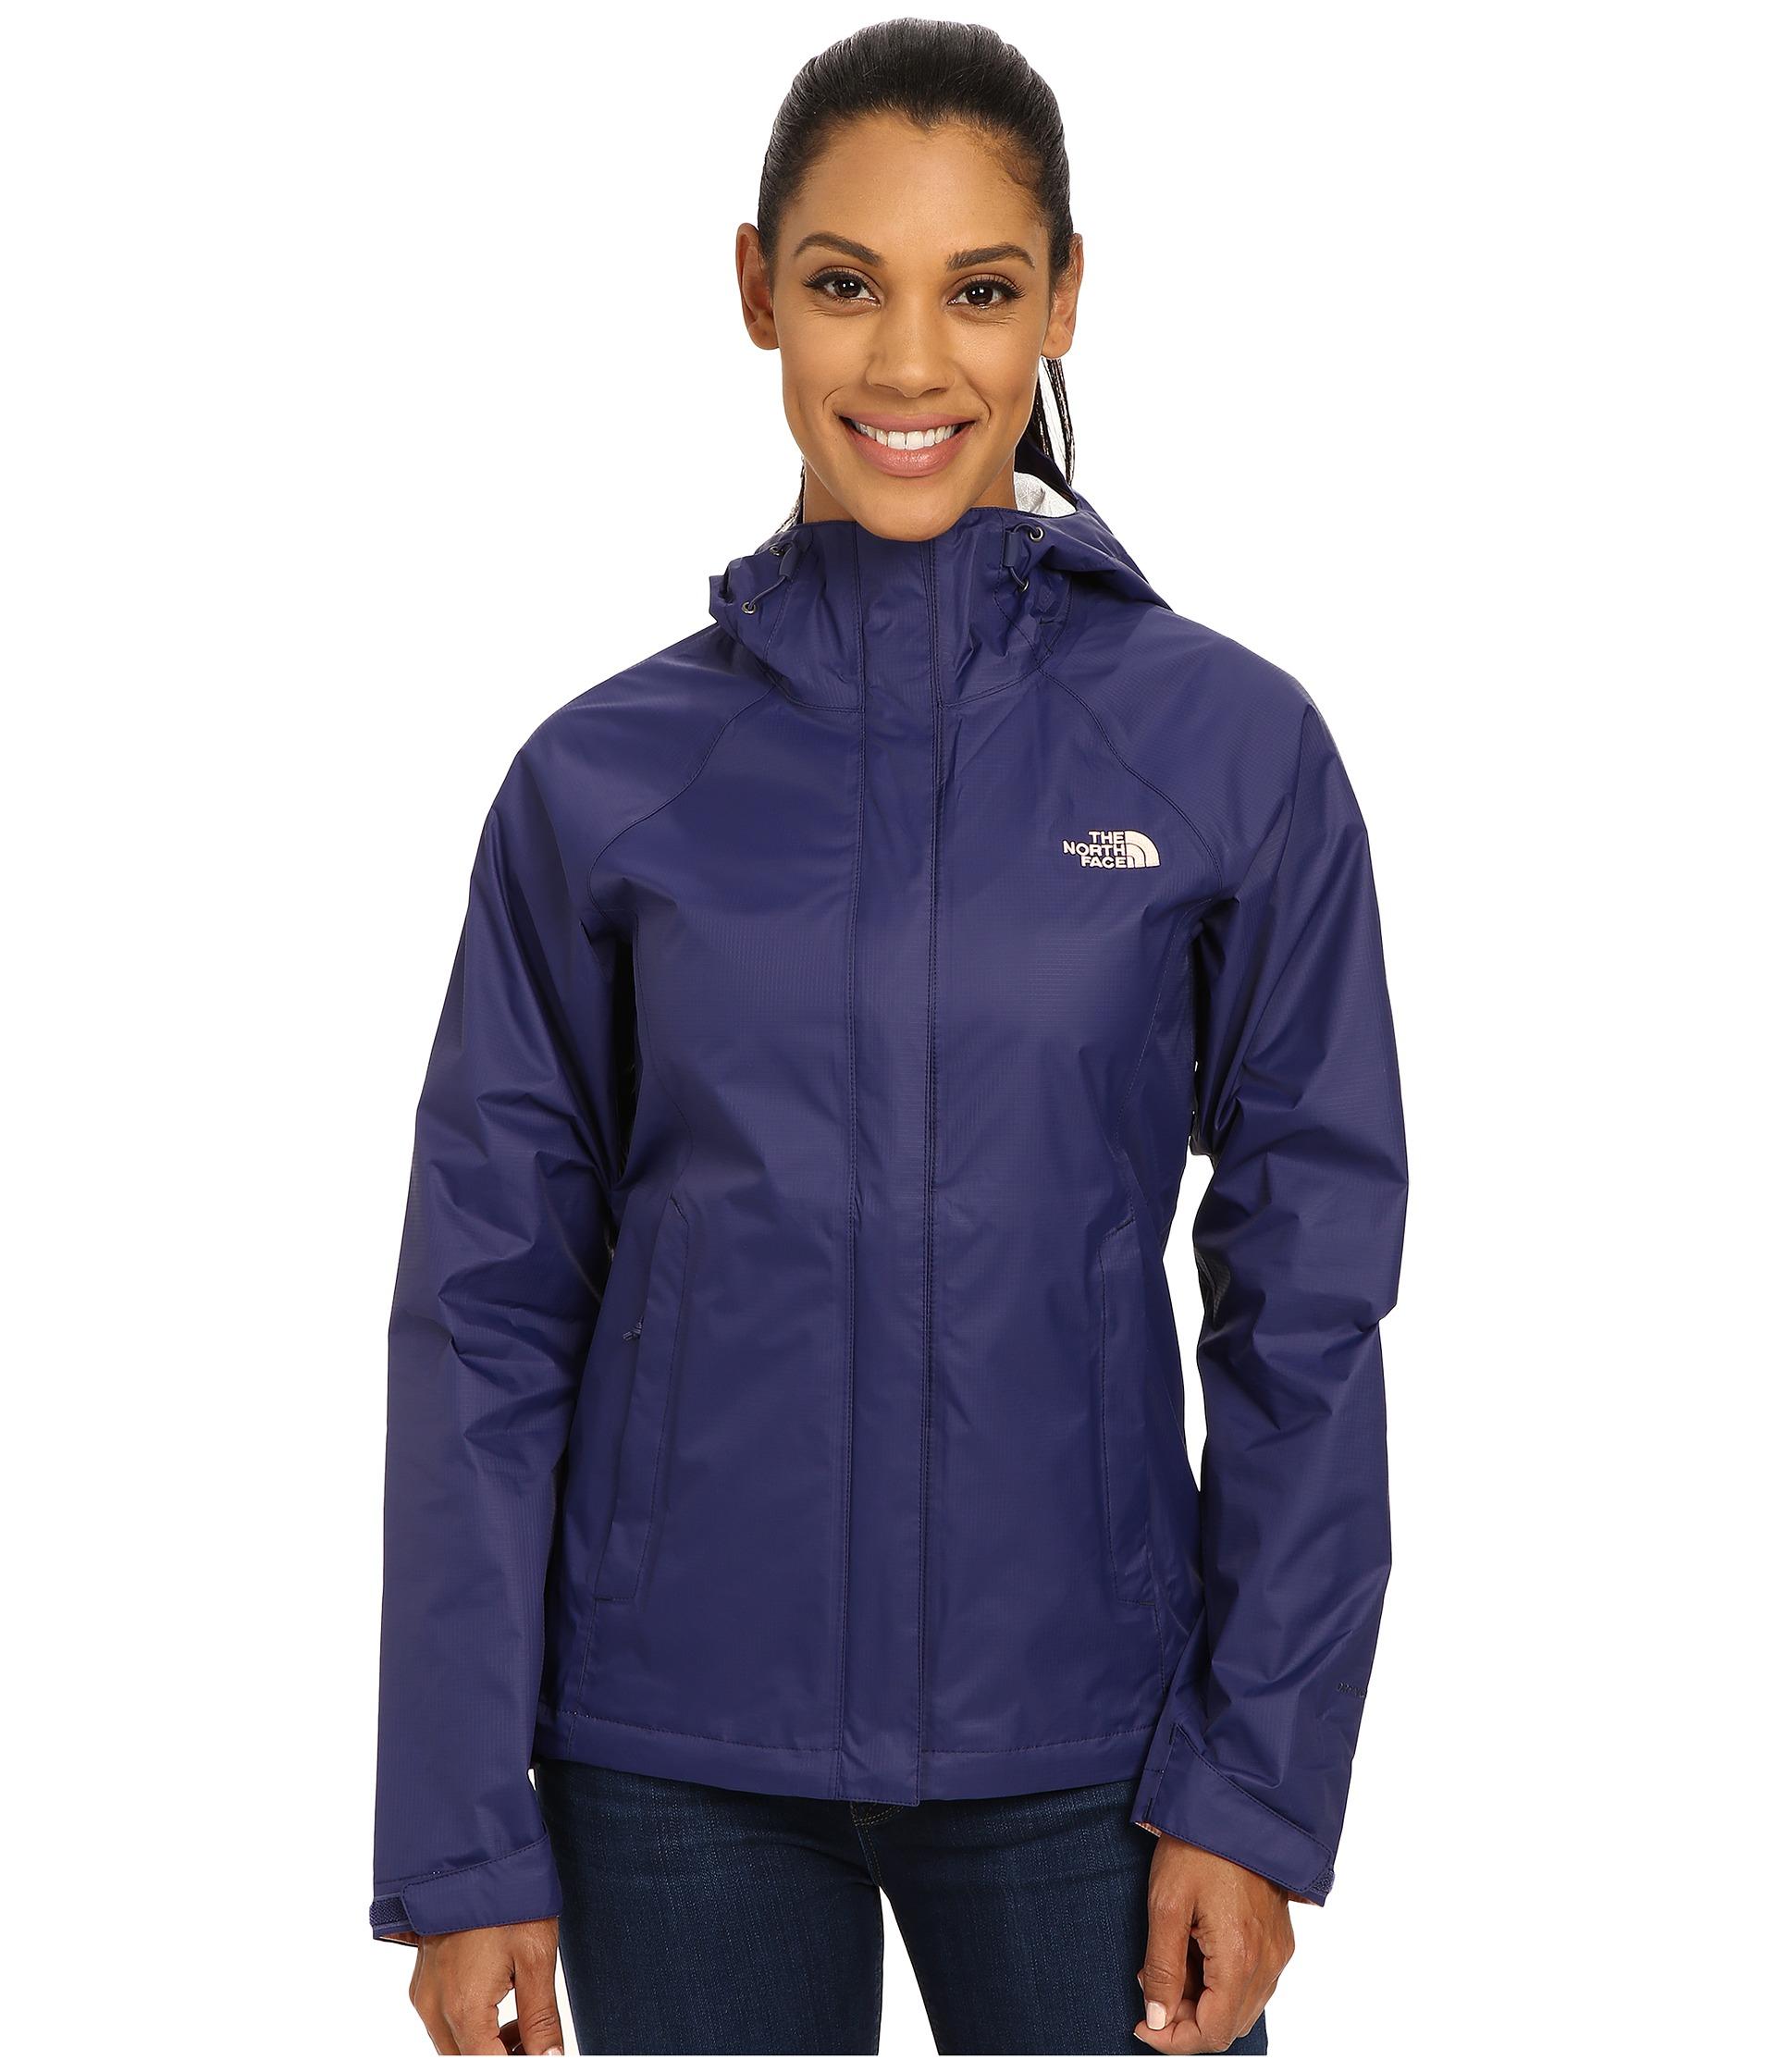 a521c325f uk north face venture jacket purple 489b1 bab96